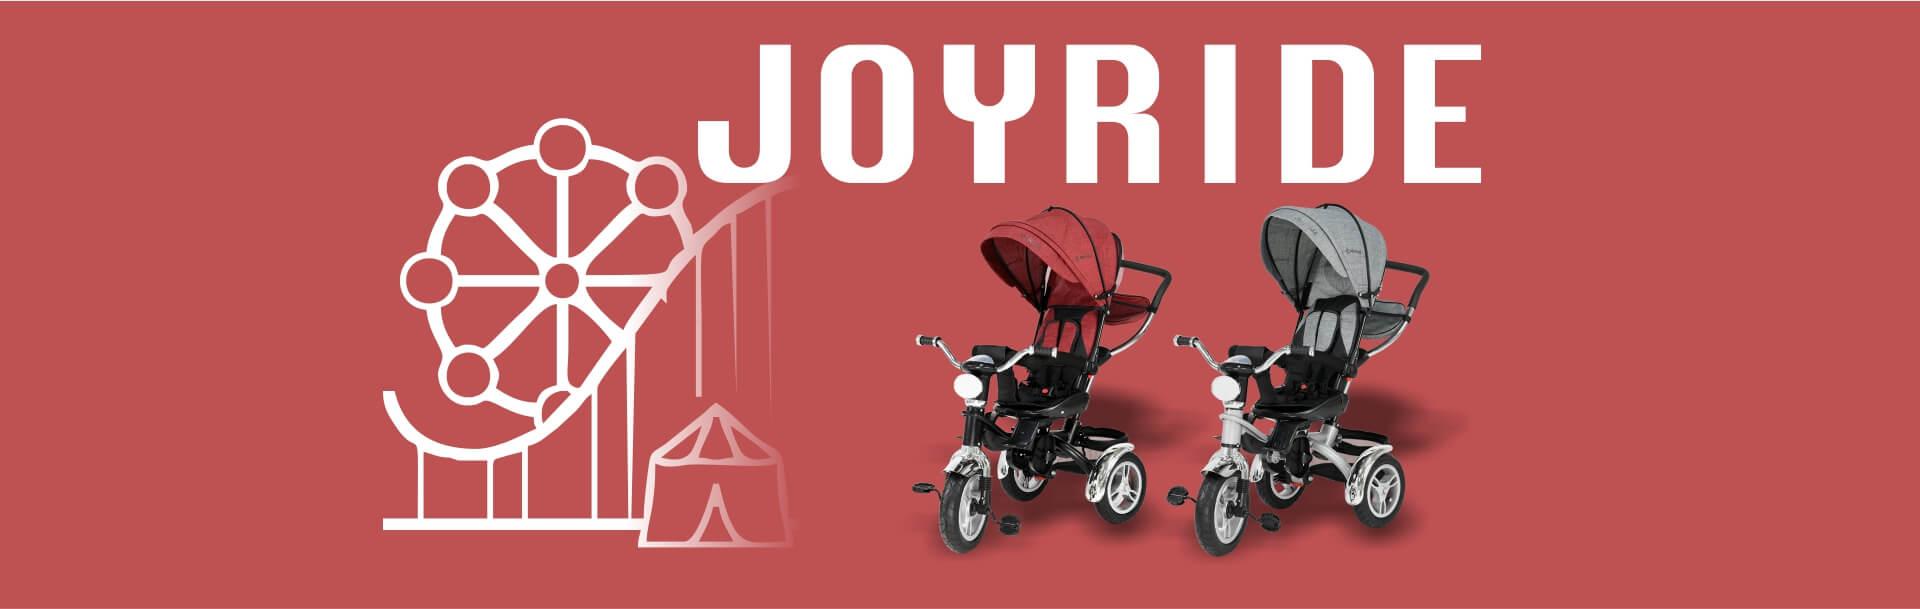 Store slider Joyride